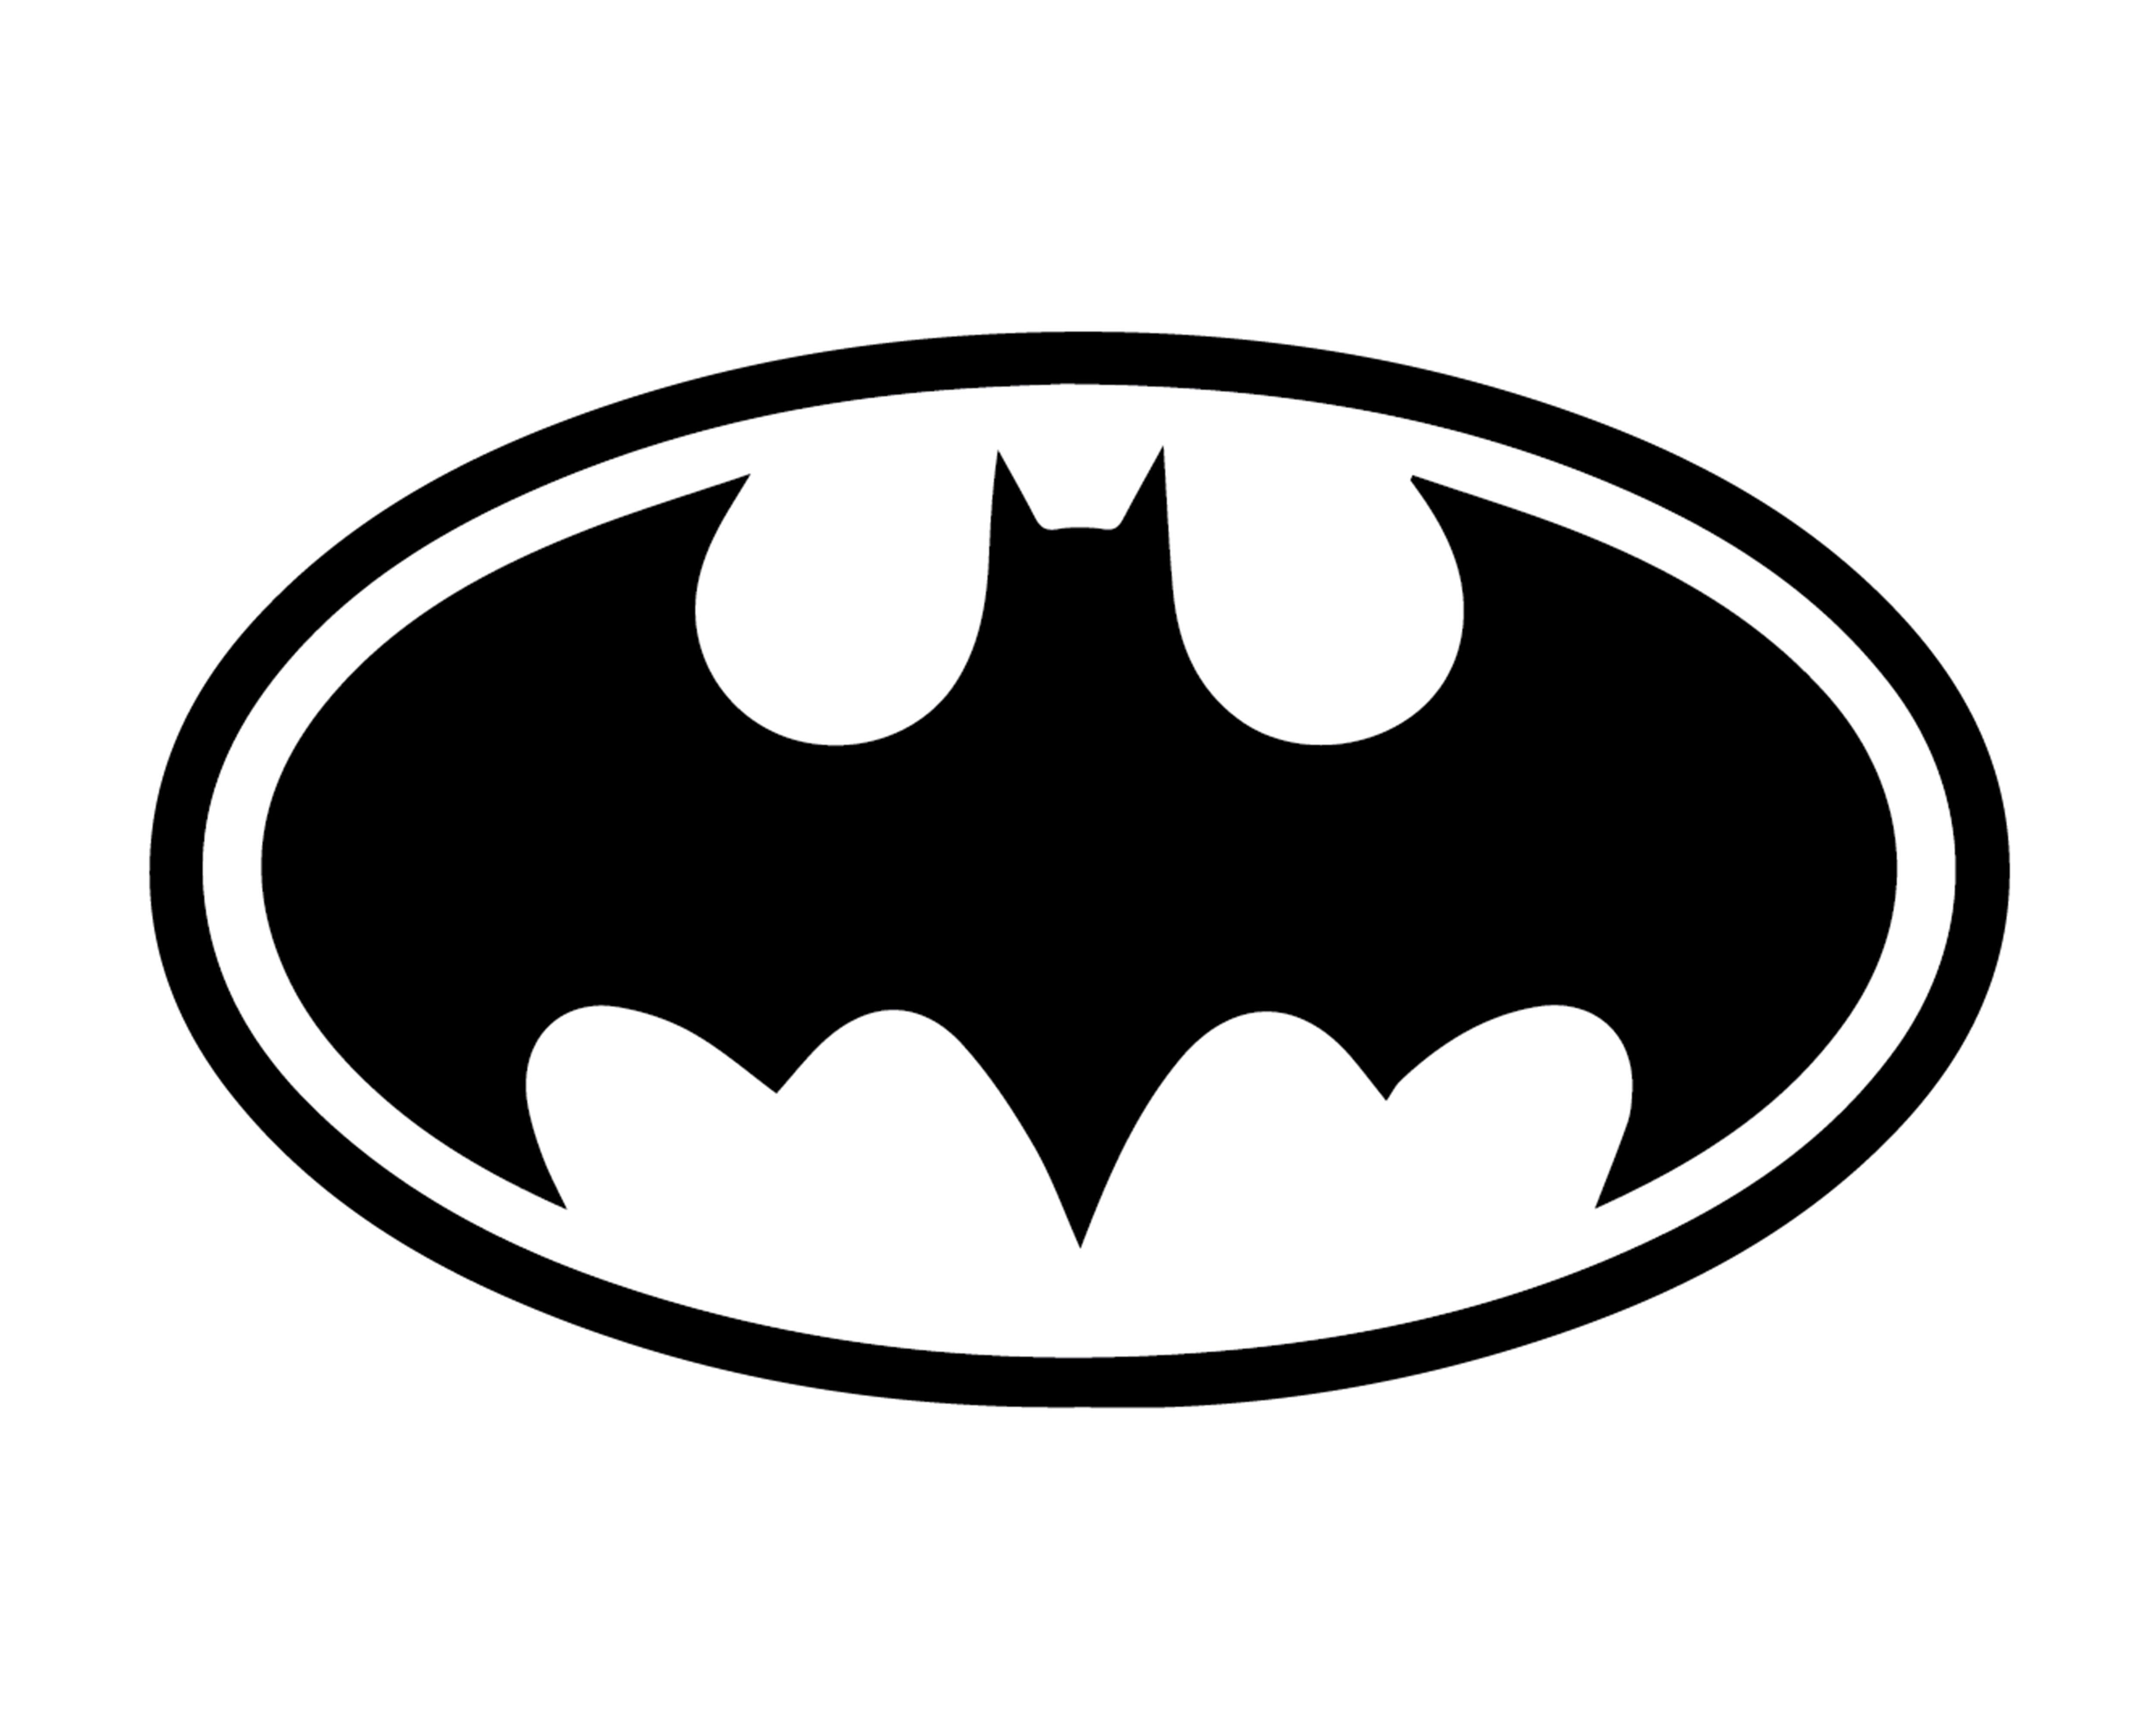 BATMAN LOGO VINYL PAINTING STENCIL SIZE PACK *HIGH QUALITY*.